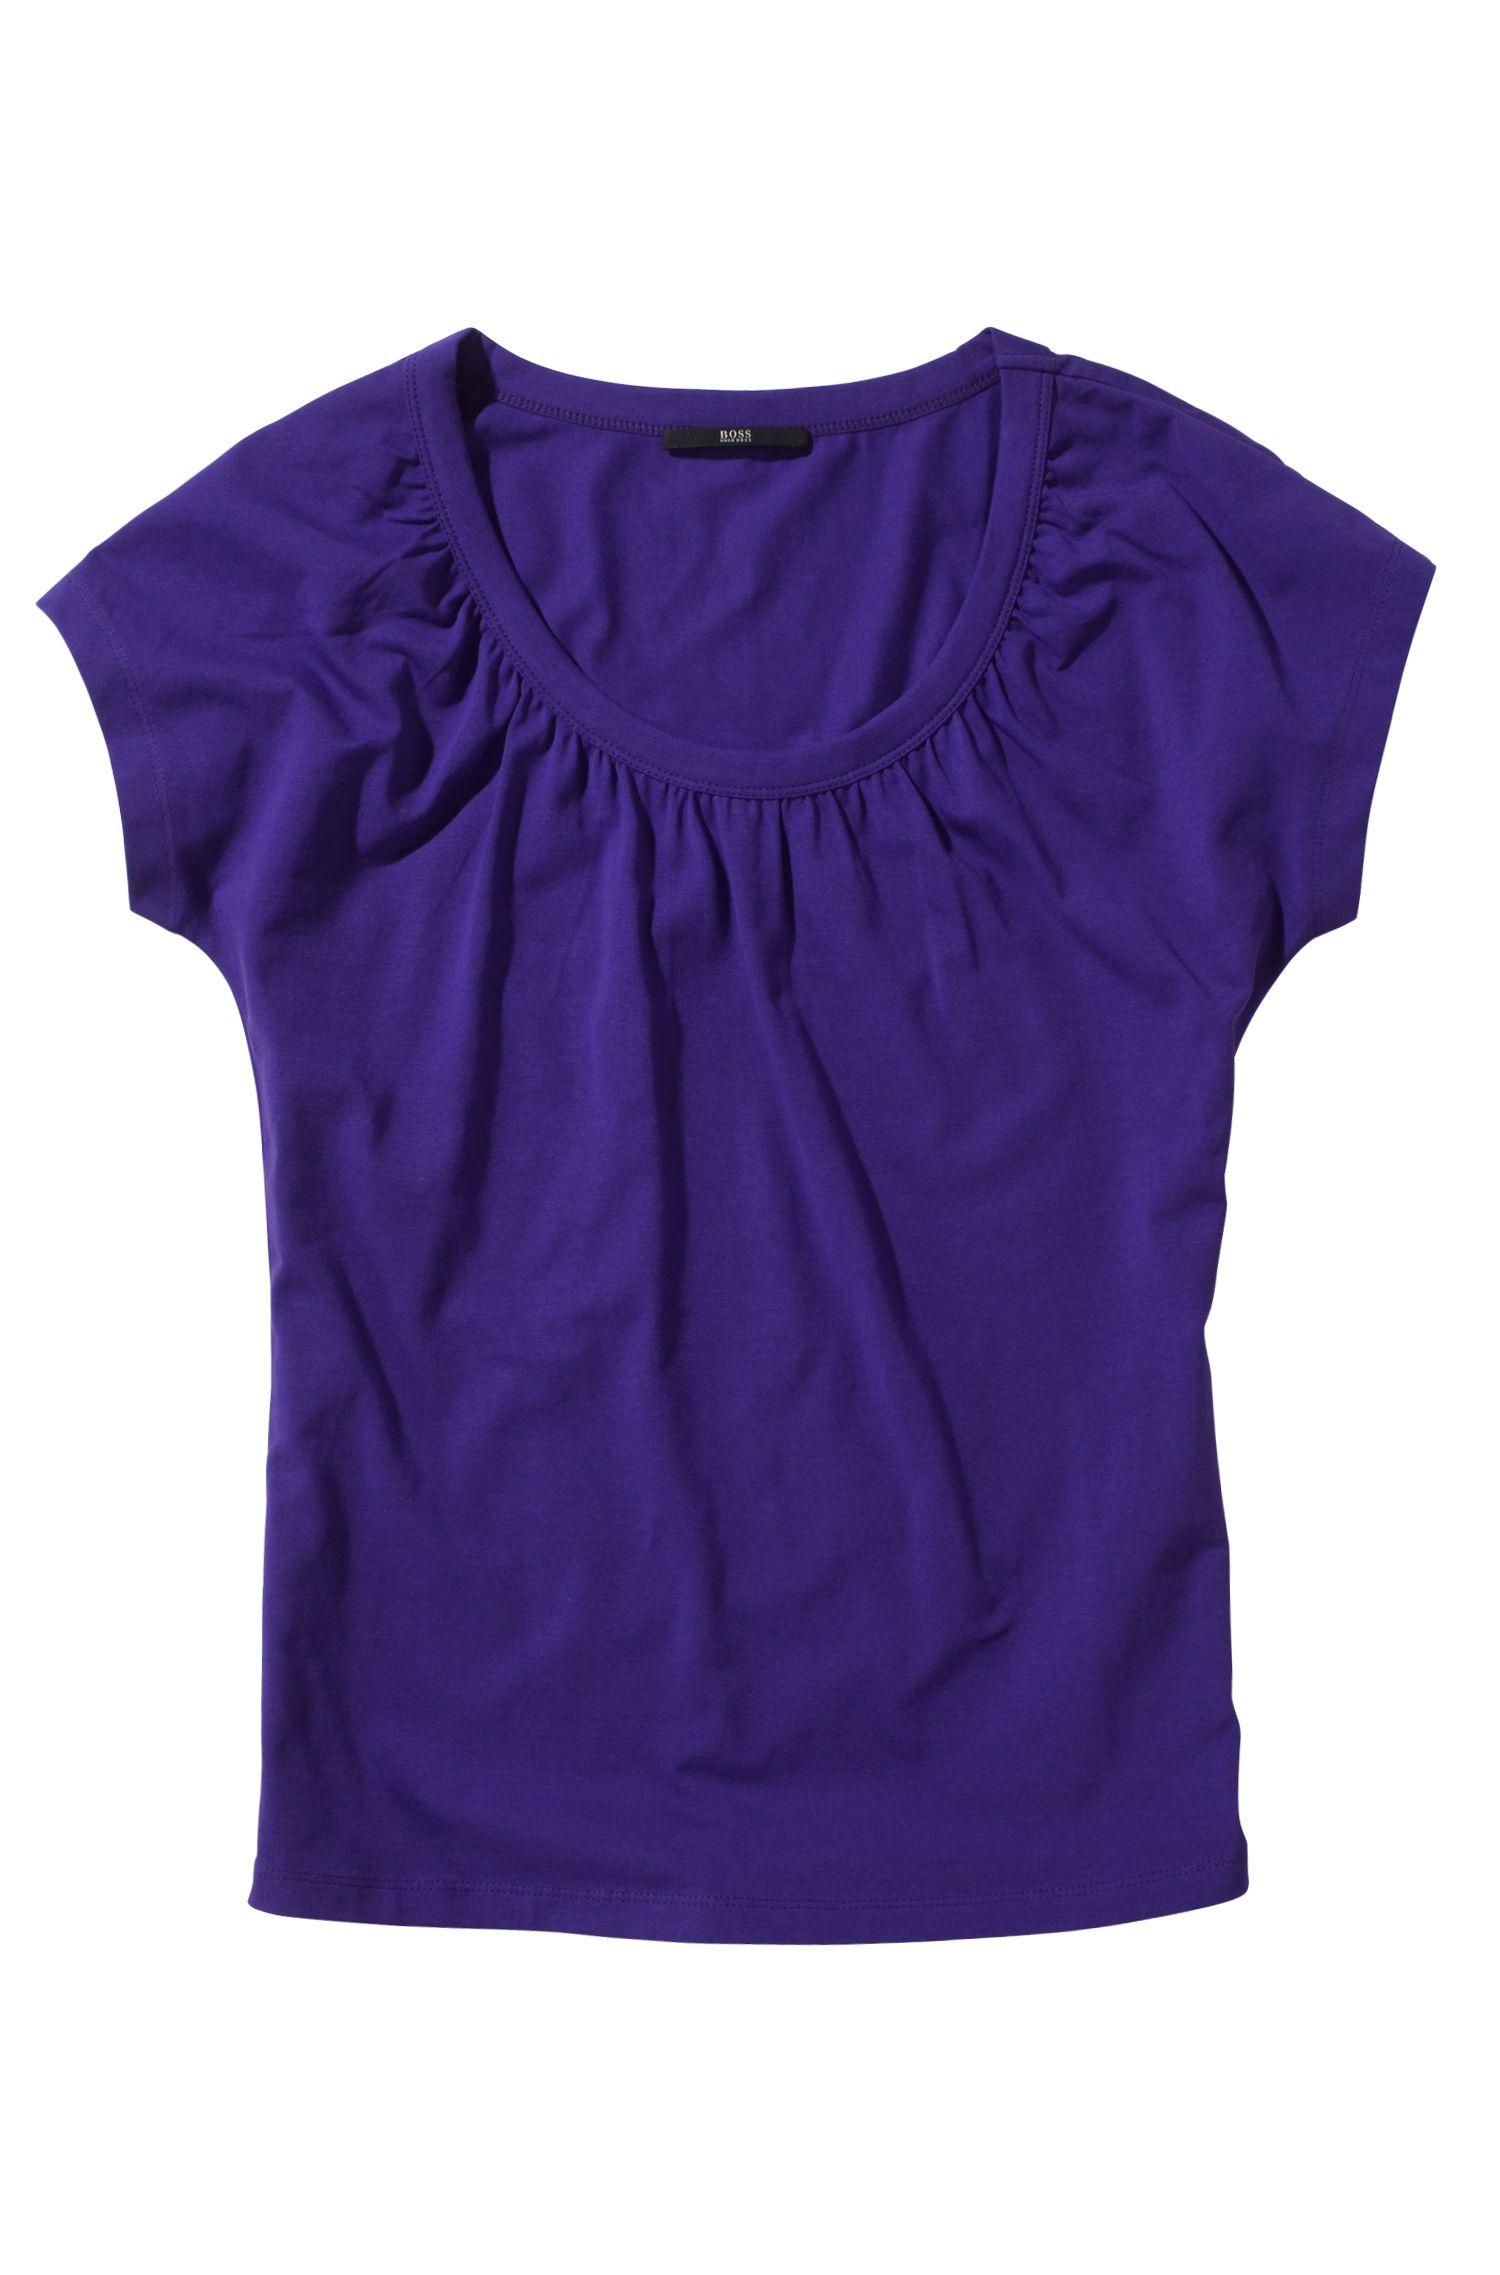 T-shirt ´E3948` met gerimpelde details